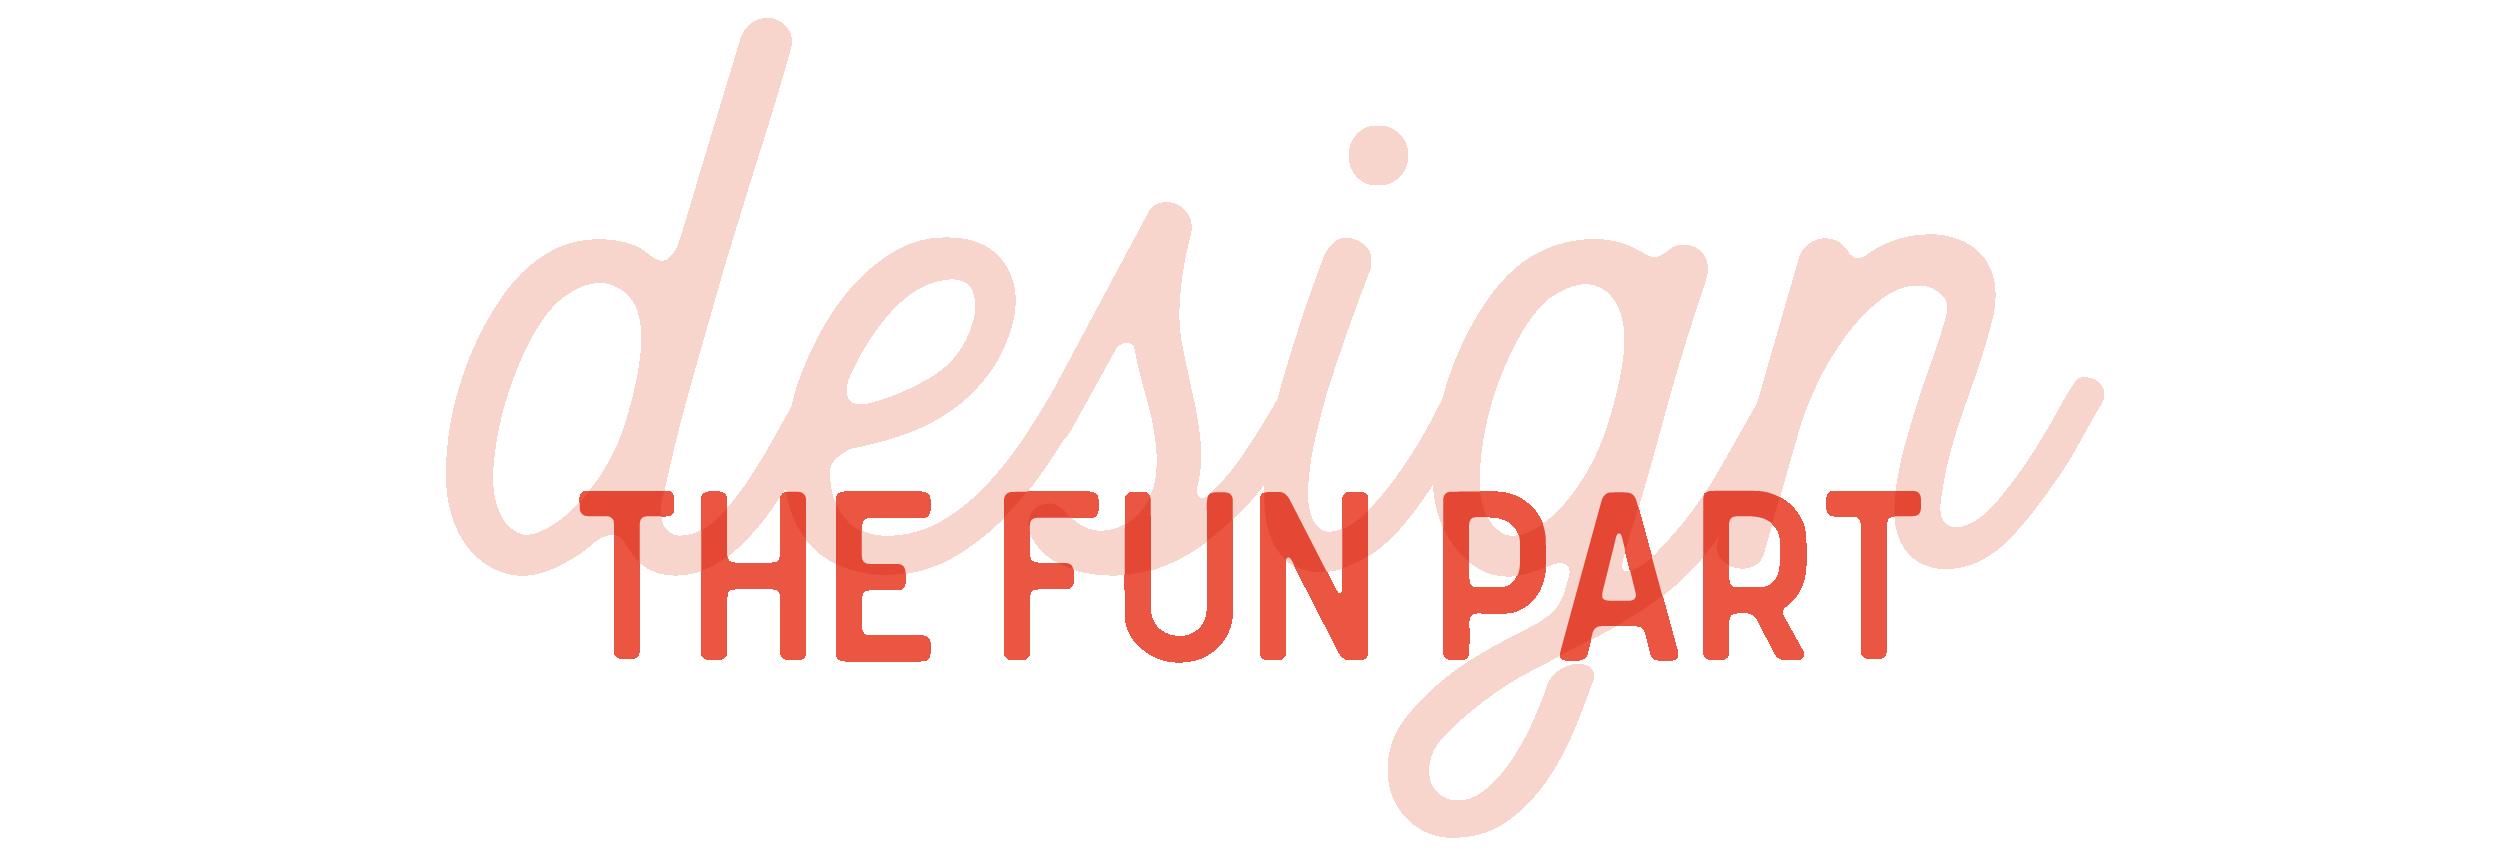 DesignShopMPLS-icons-03.png